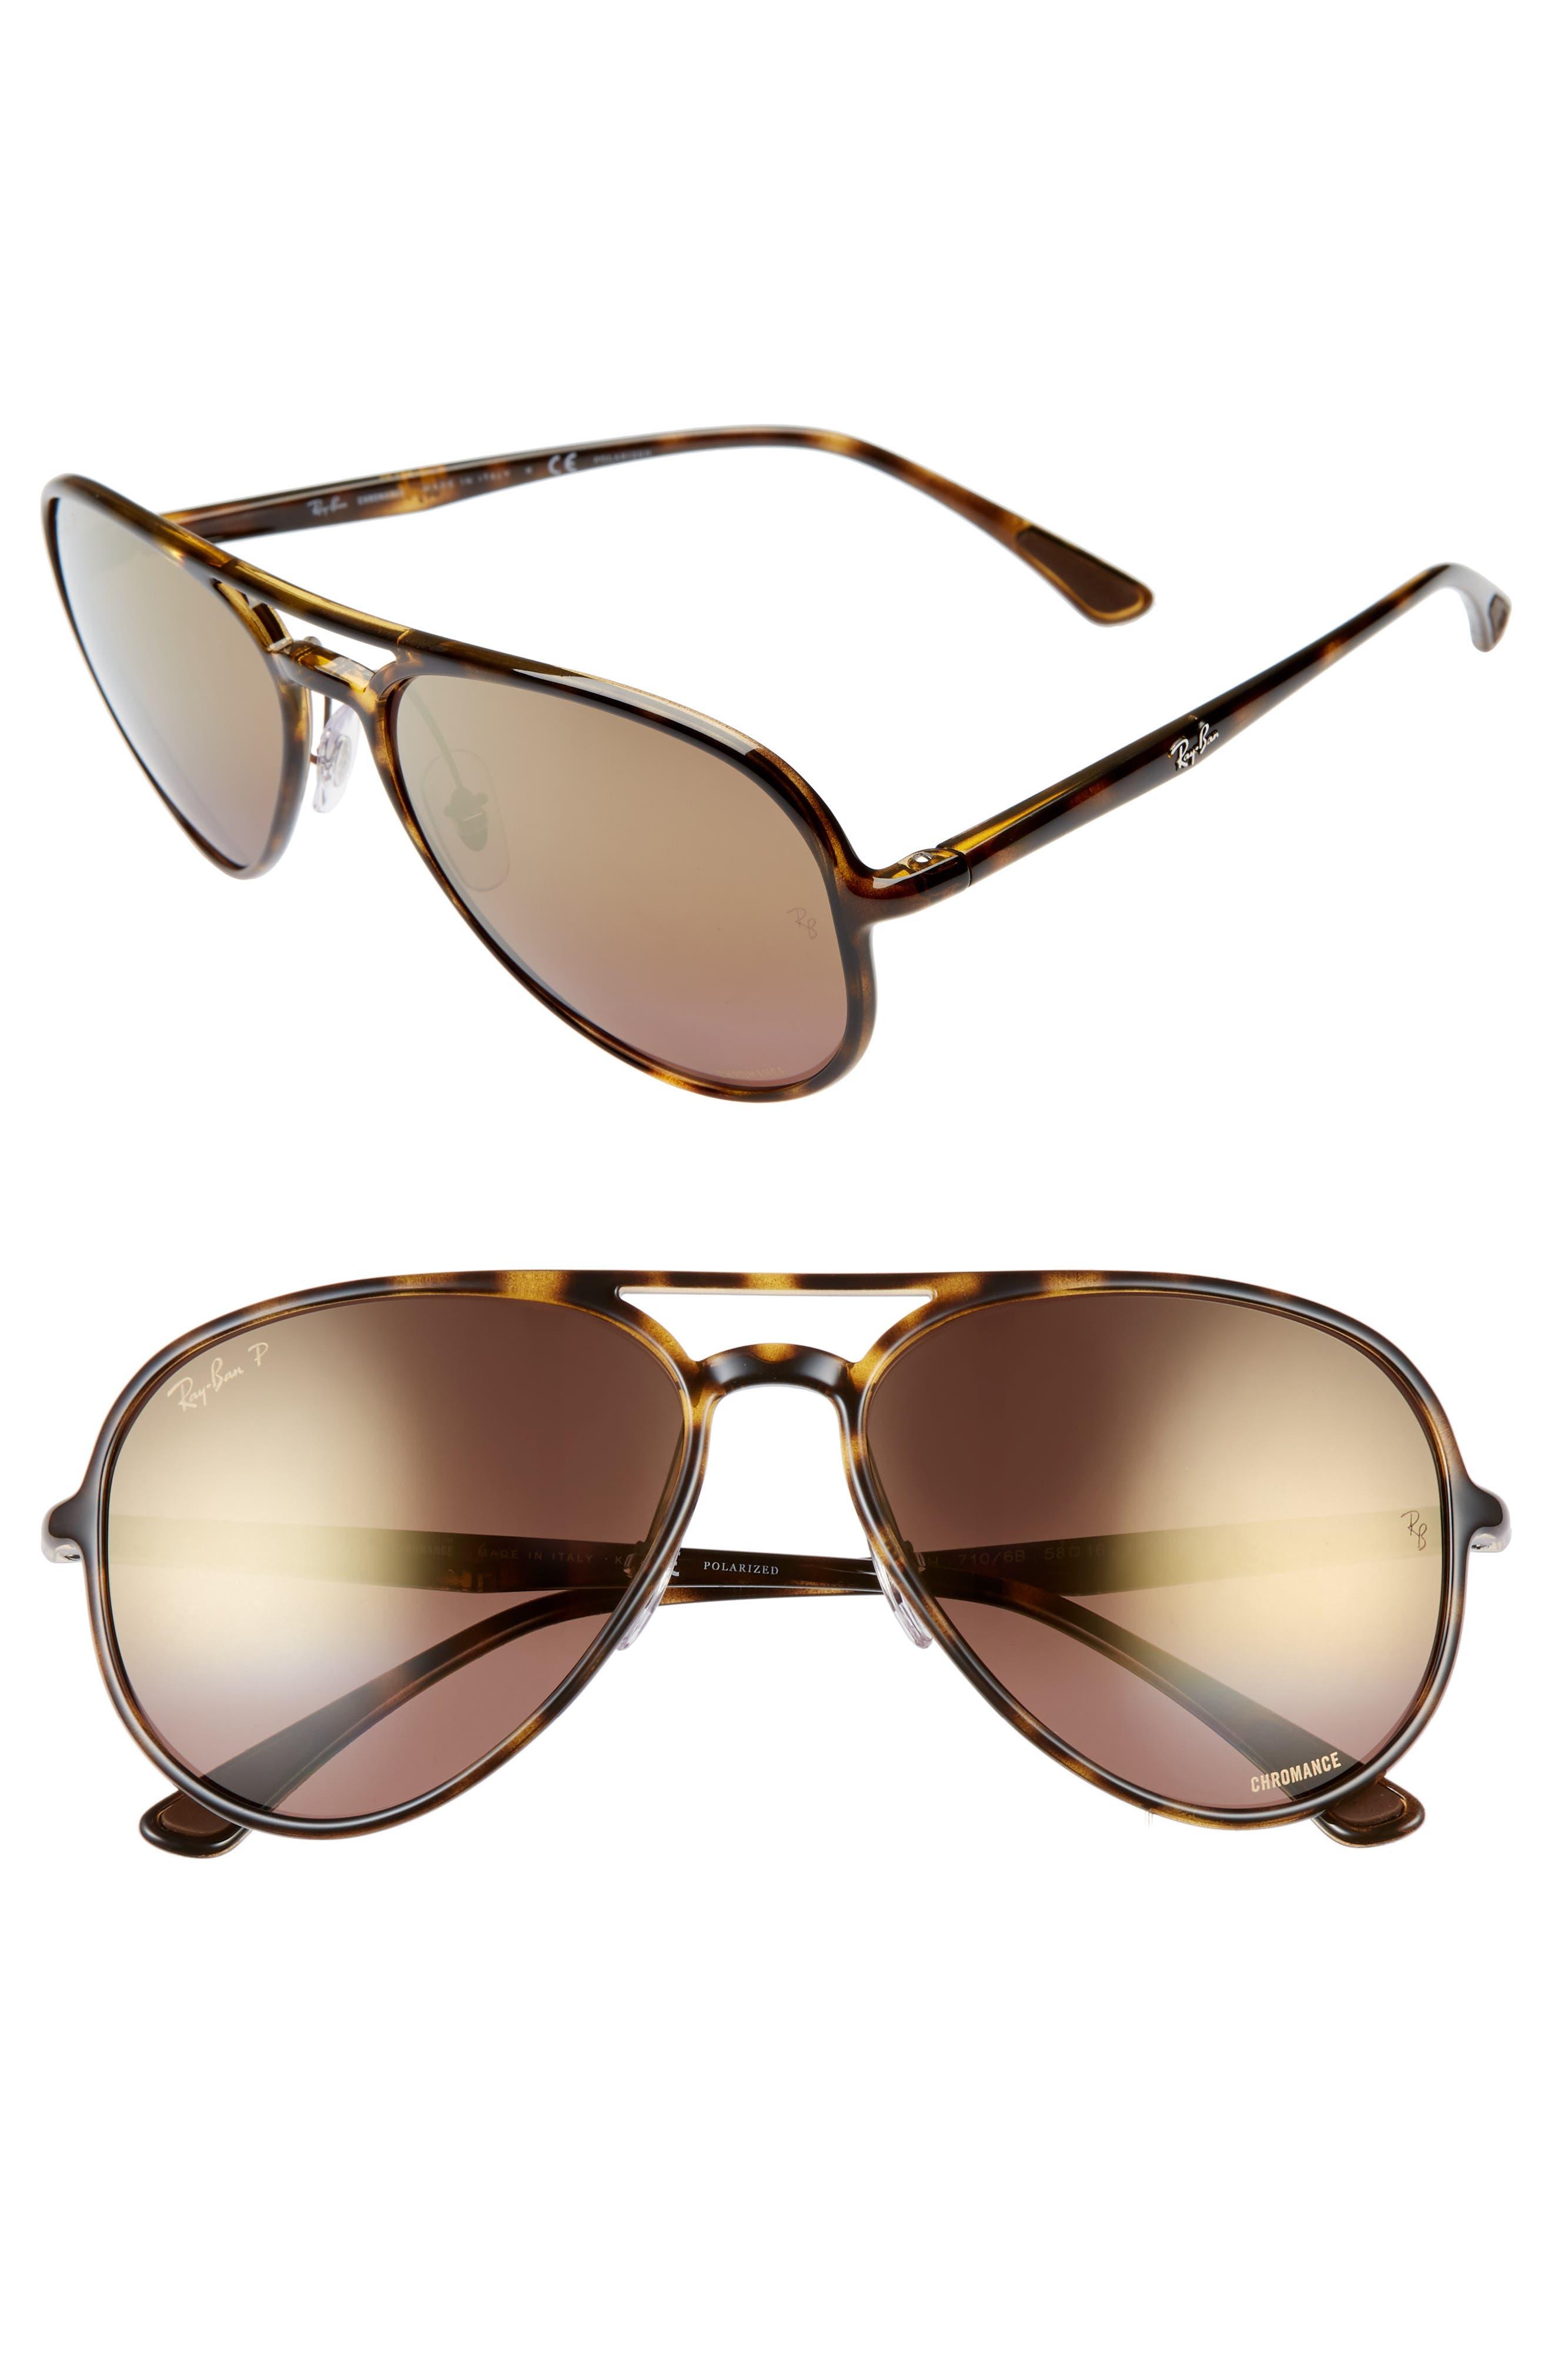 Ray-Ban 5m Chromance Polarized Aviator Sunglasses - Havana/ Gold Gradient Mirror